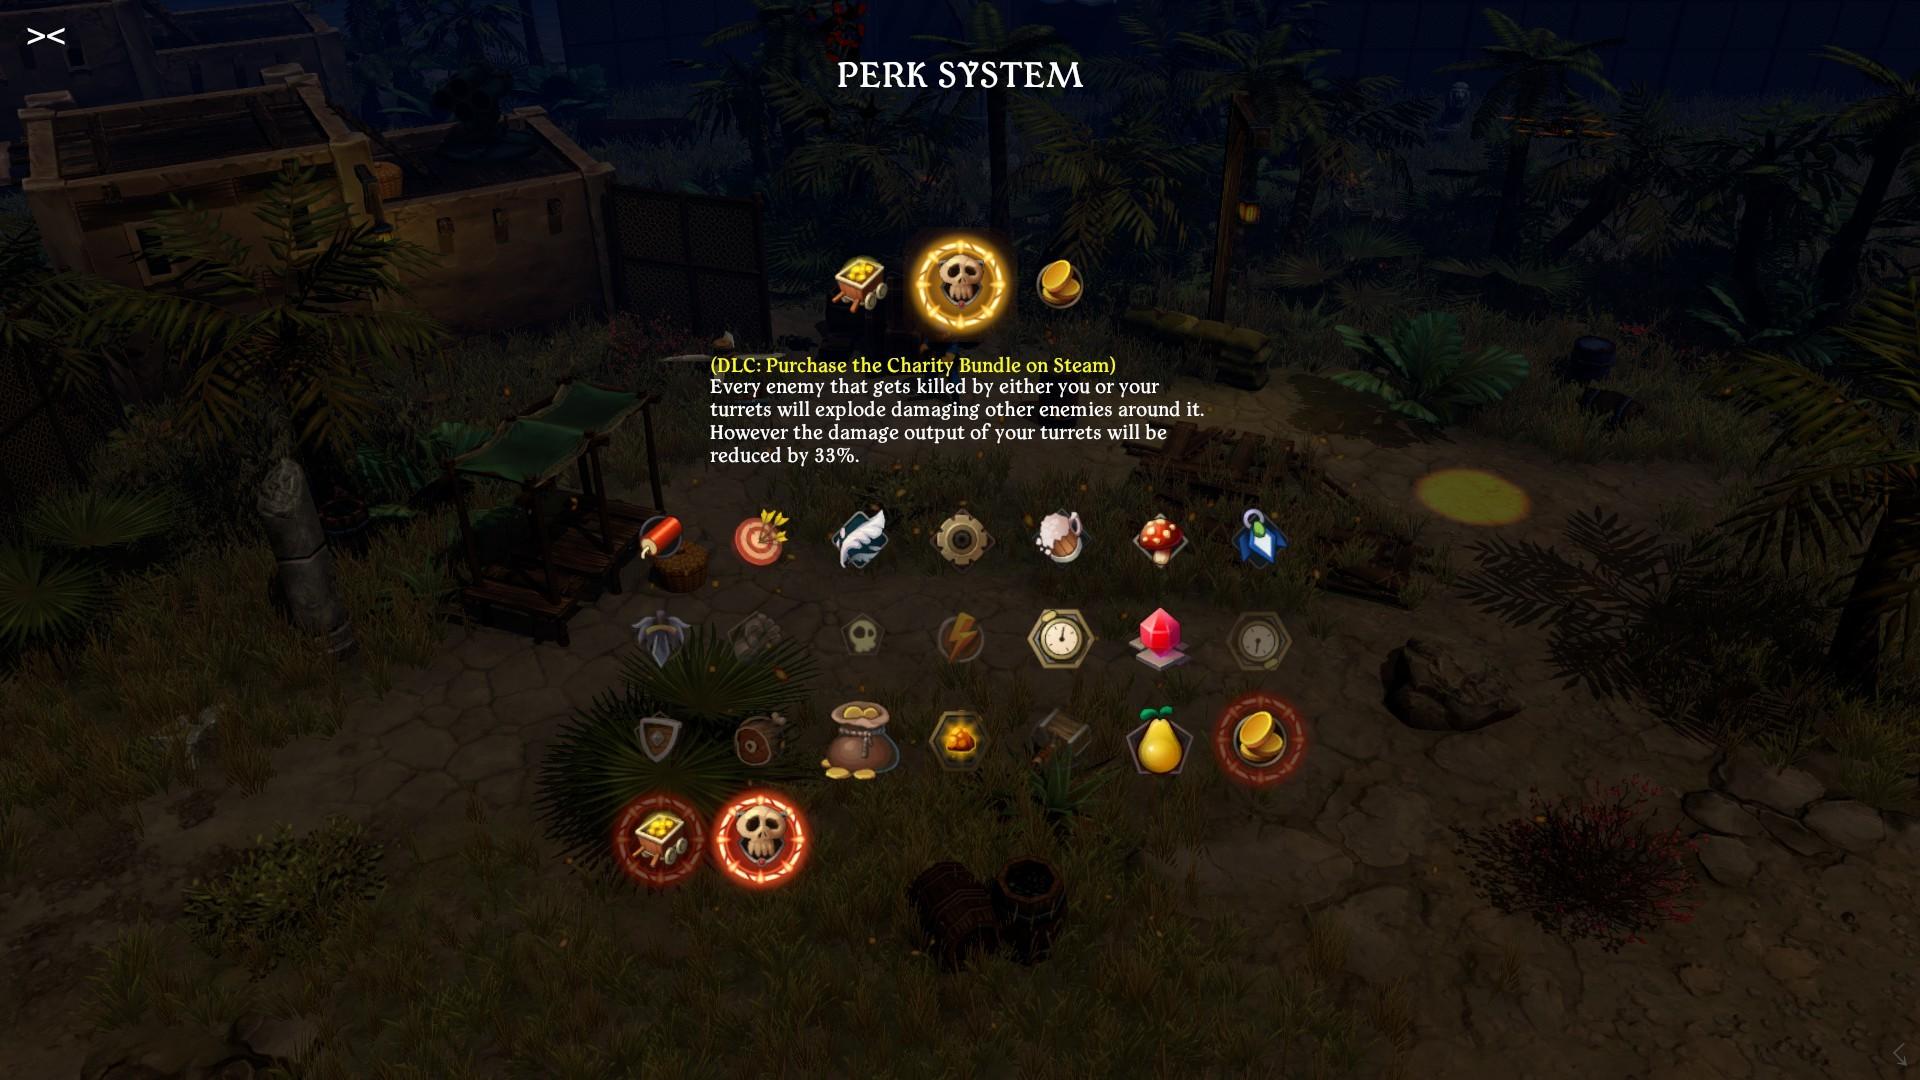 The Mutational - Charity Bundle screenshot